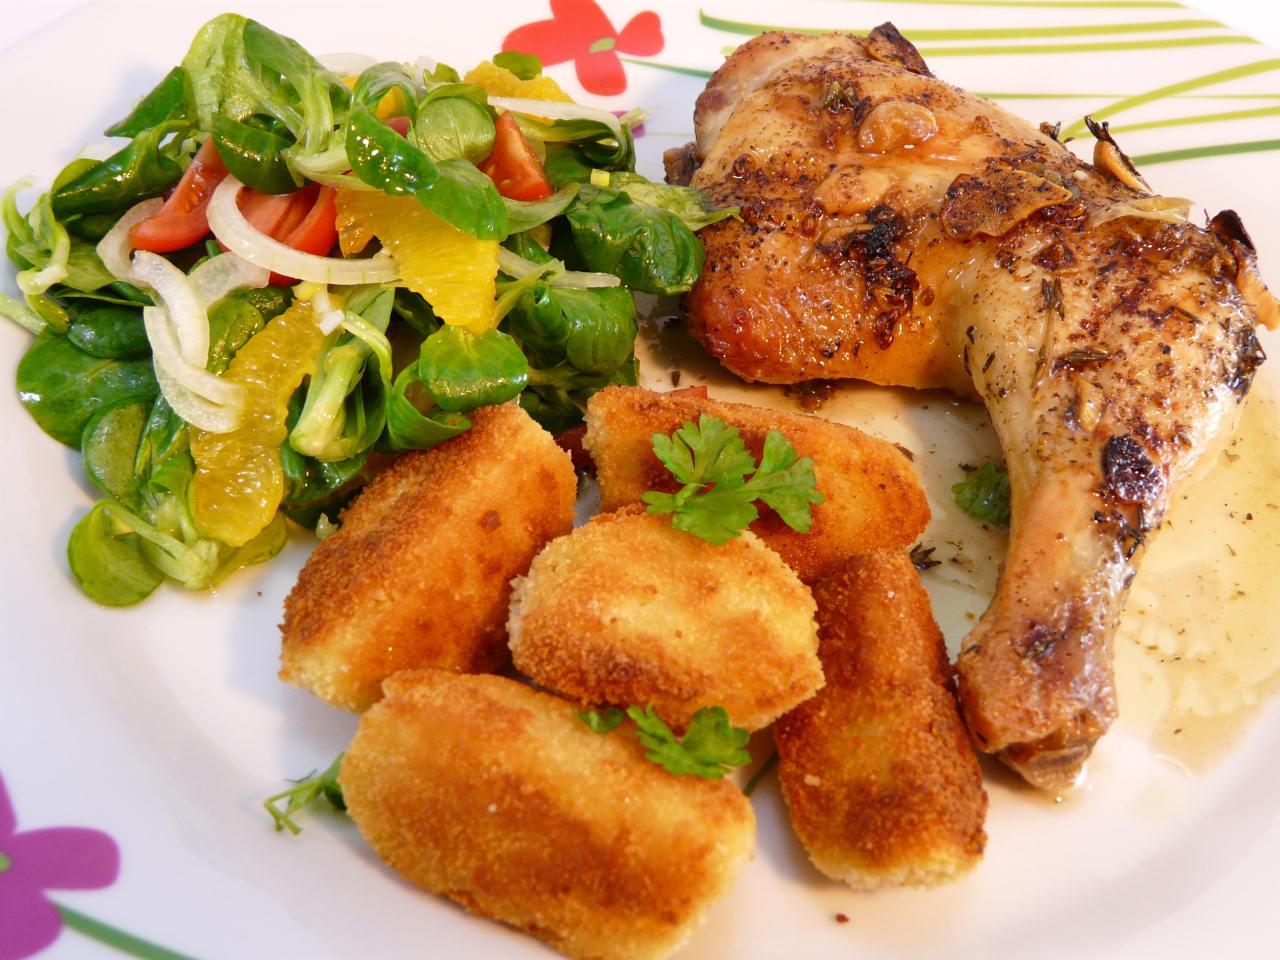 Huhn mit Knoblauch